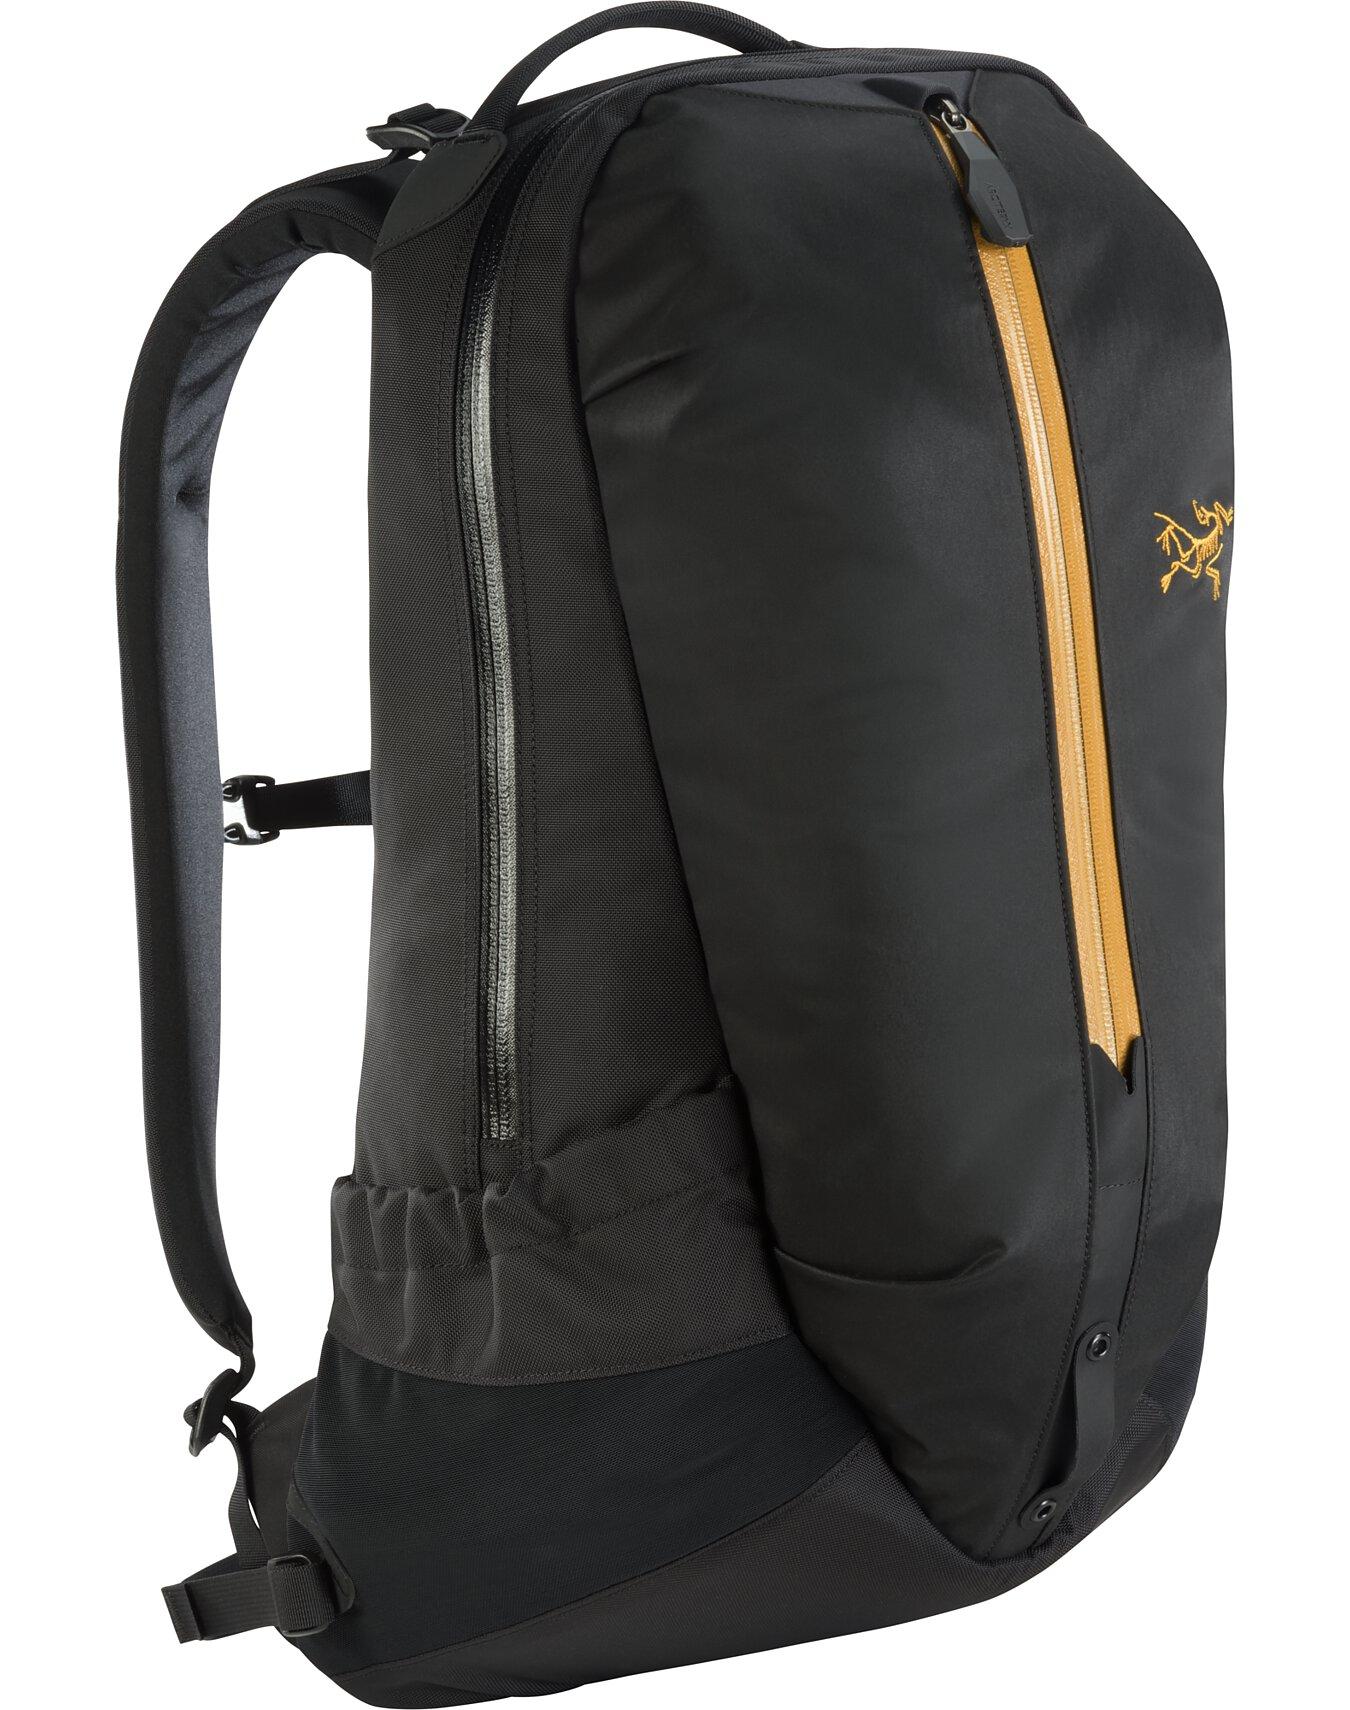 Arro 22 Backpack   Arc'teryx